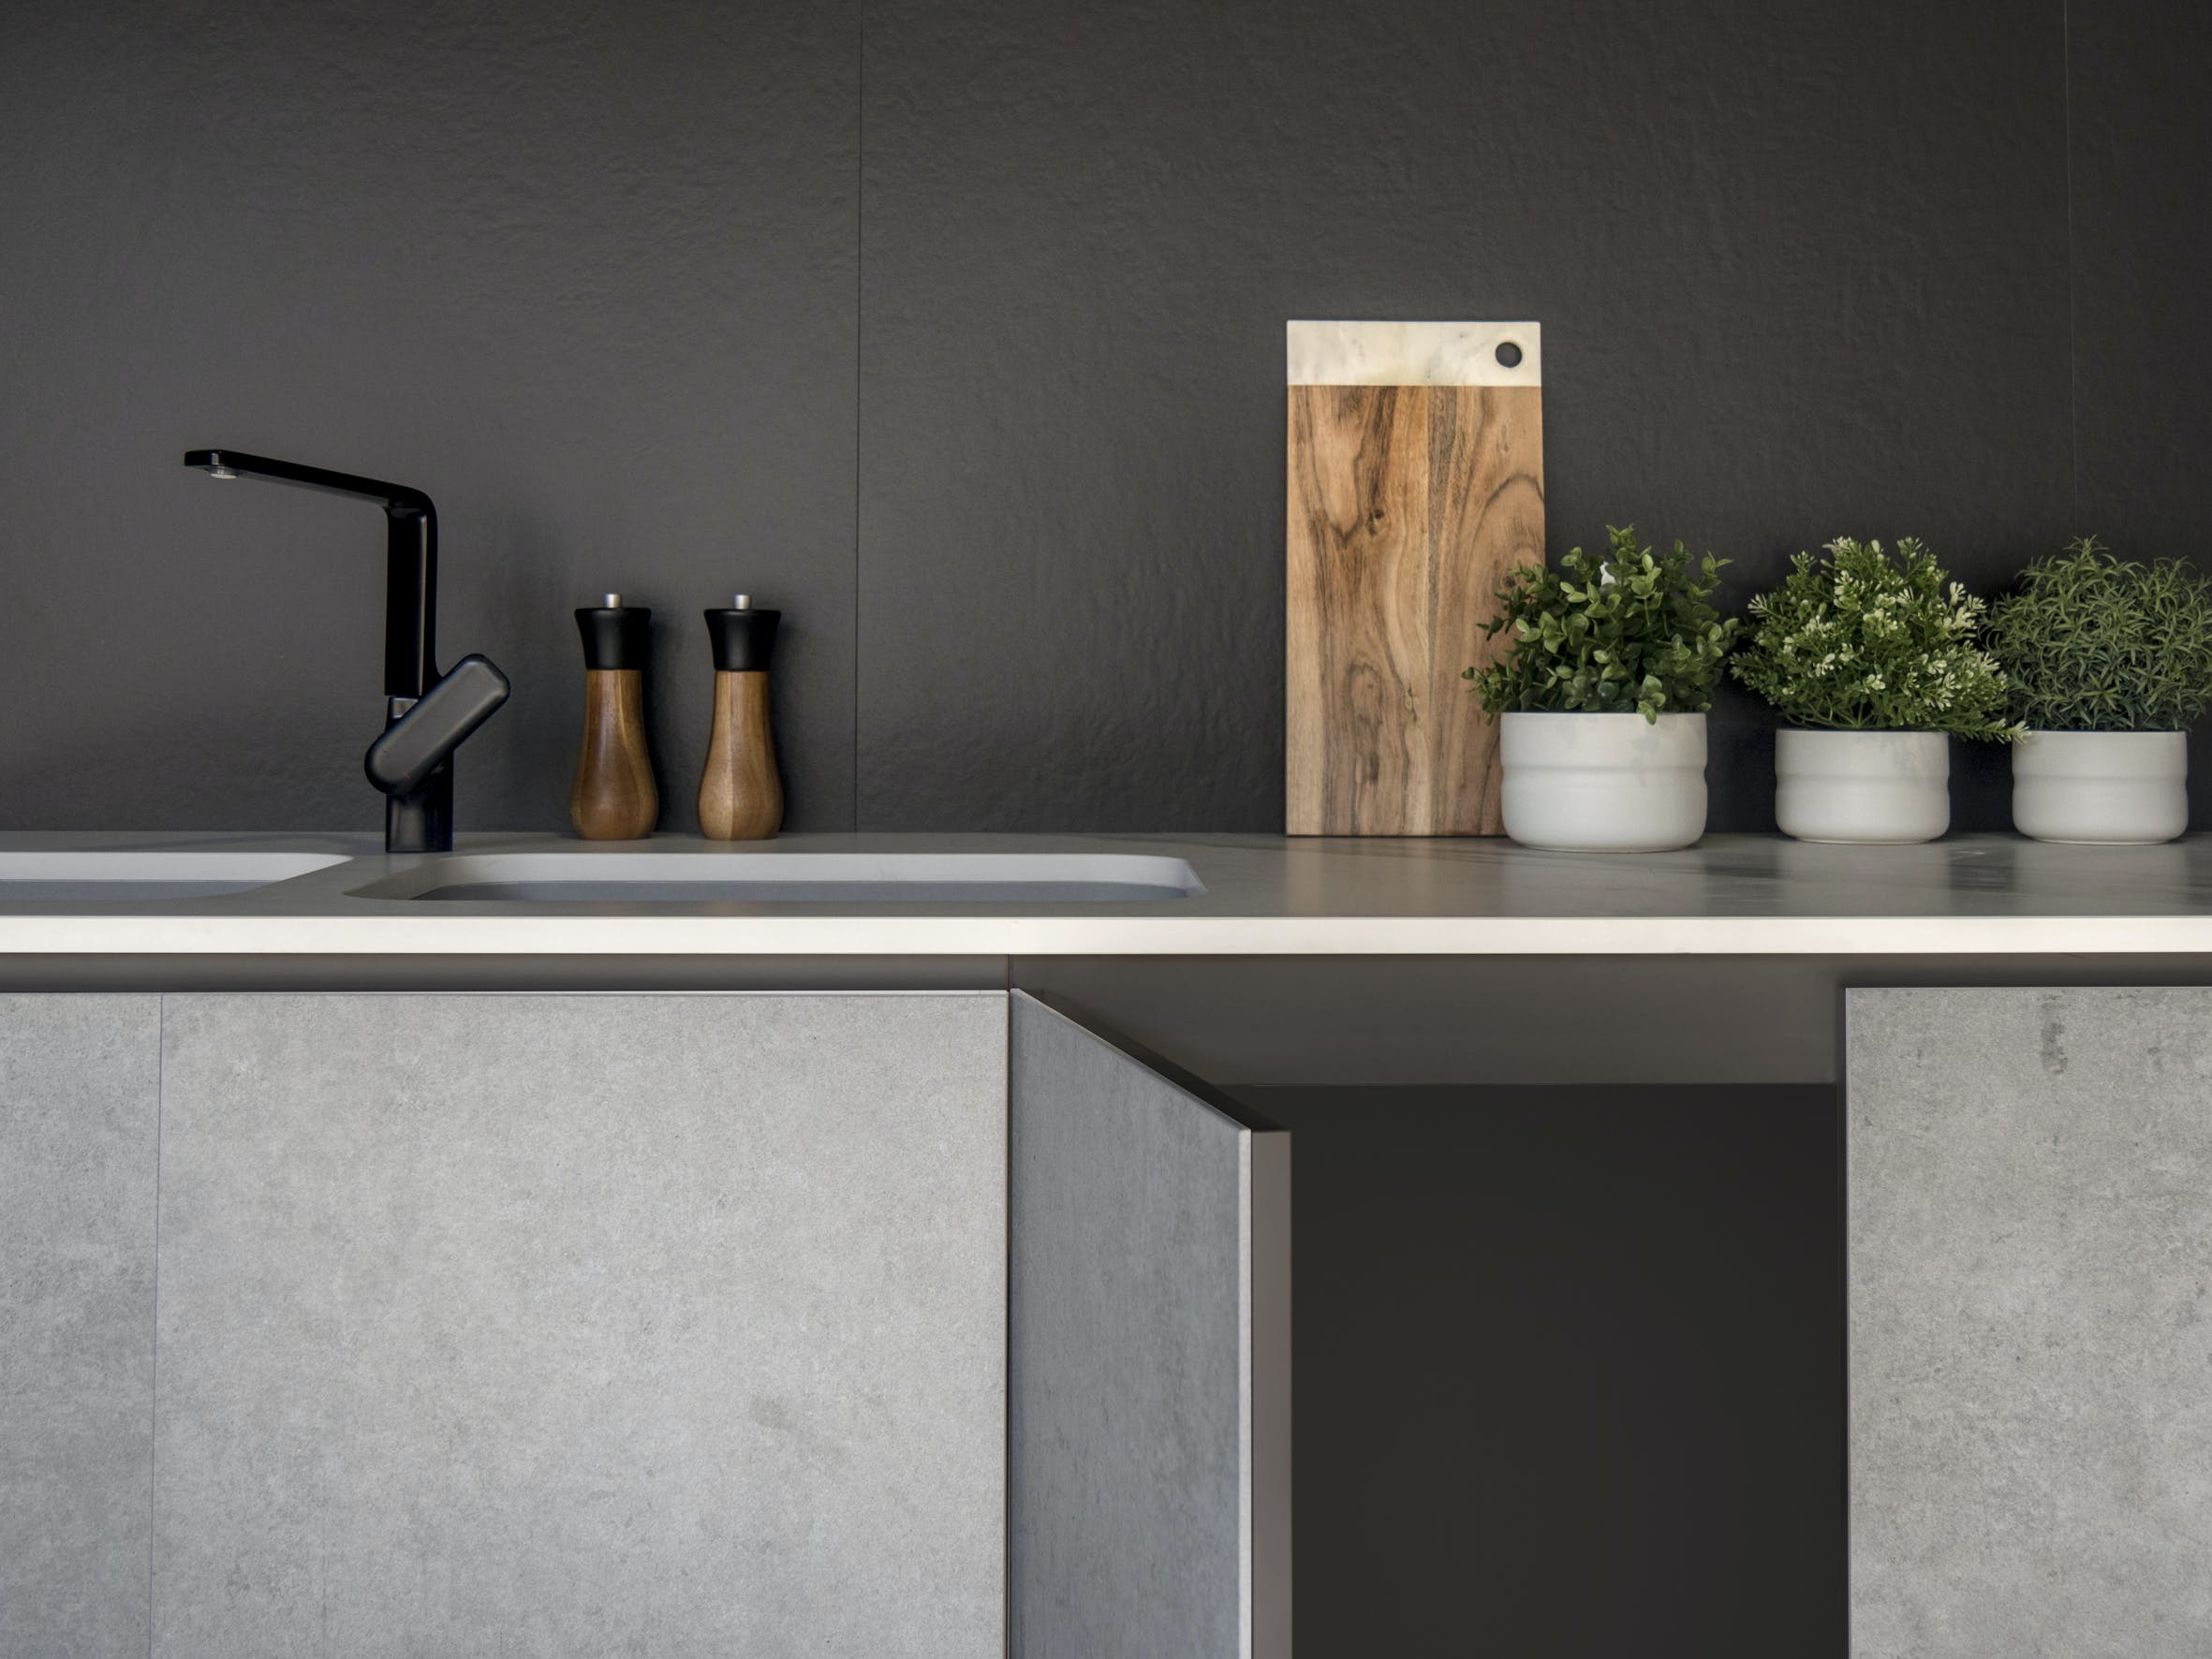 Image of Dekton Slim 4mm Kreta cabinetry cladding Dekton Slim 4mm Sirius splashback 1 in Dekton Slim Wins at the Designer Kitchen and Bathroom Awards 2019 - Cosentino